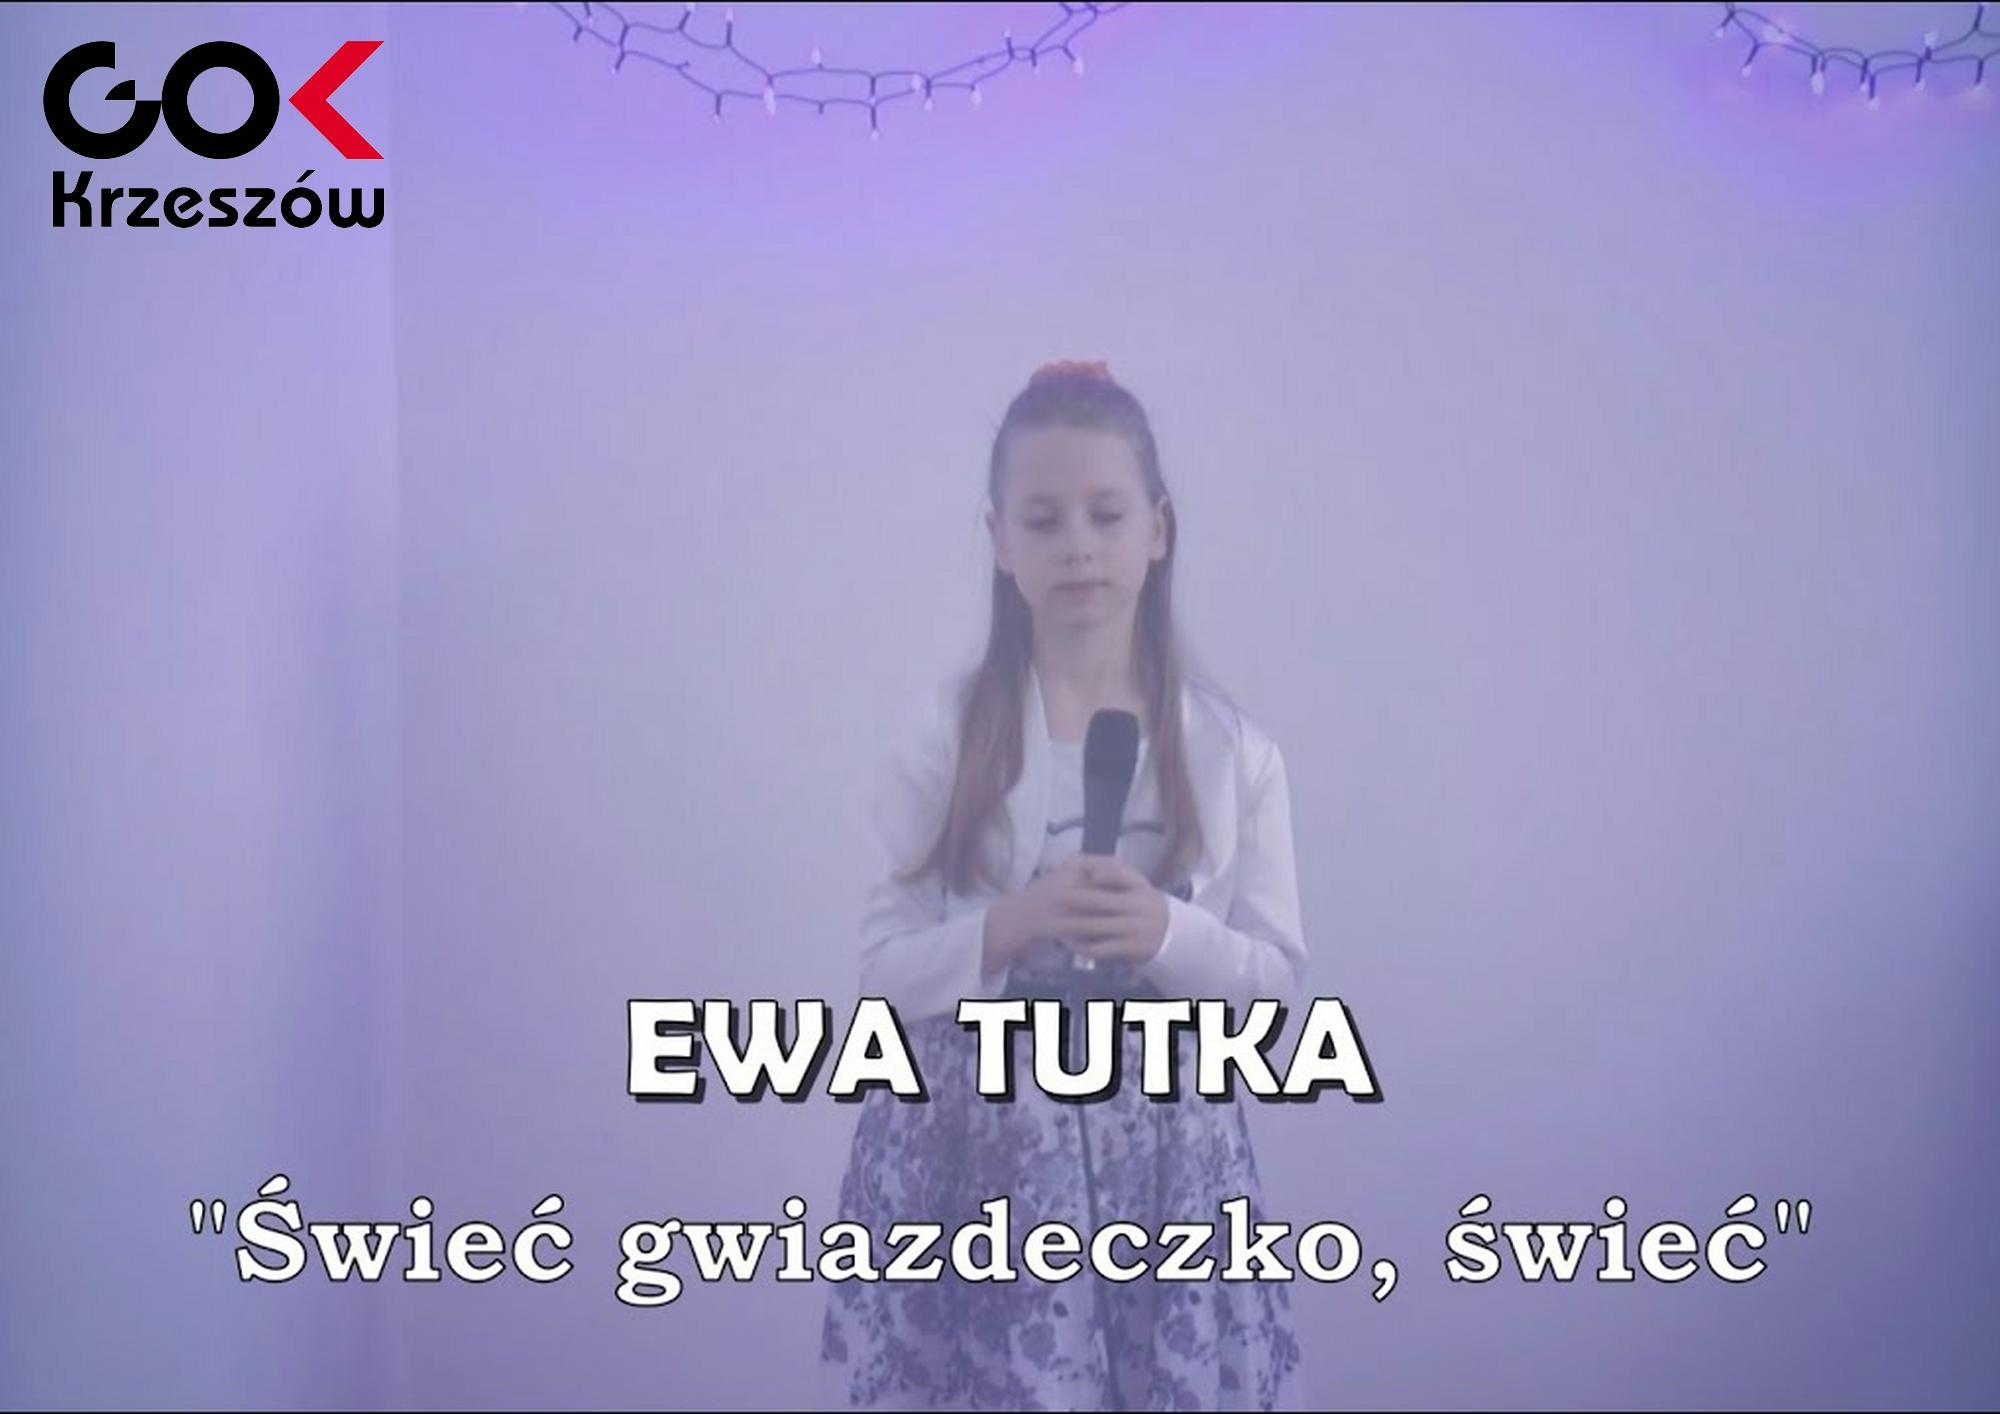 Ewa Tutka